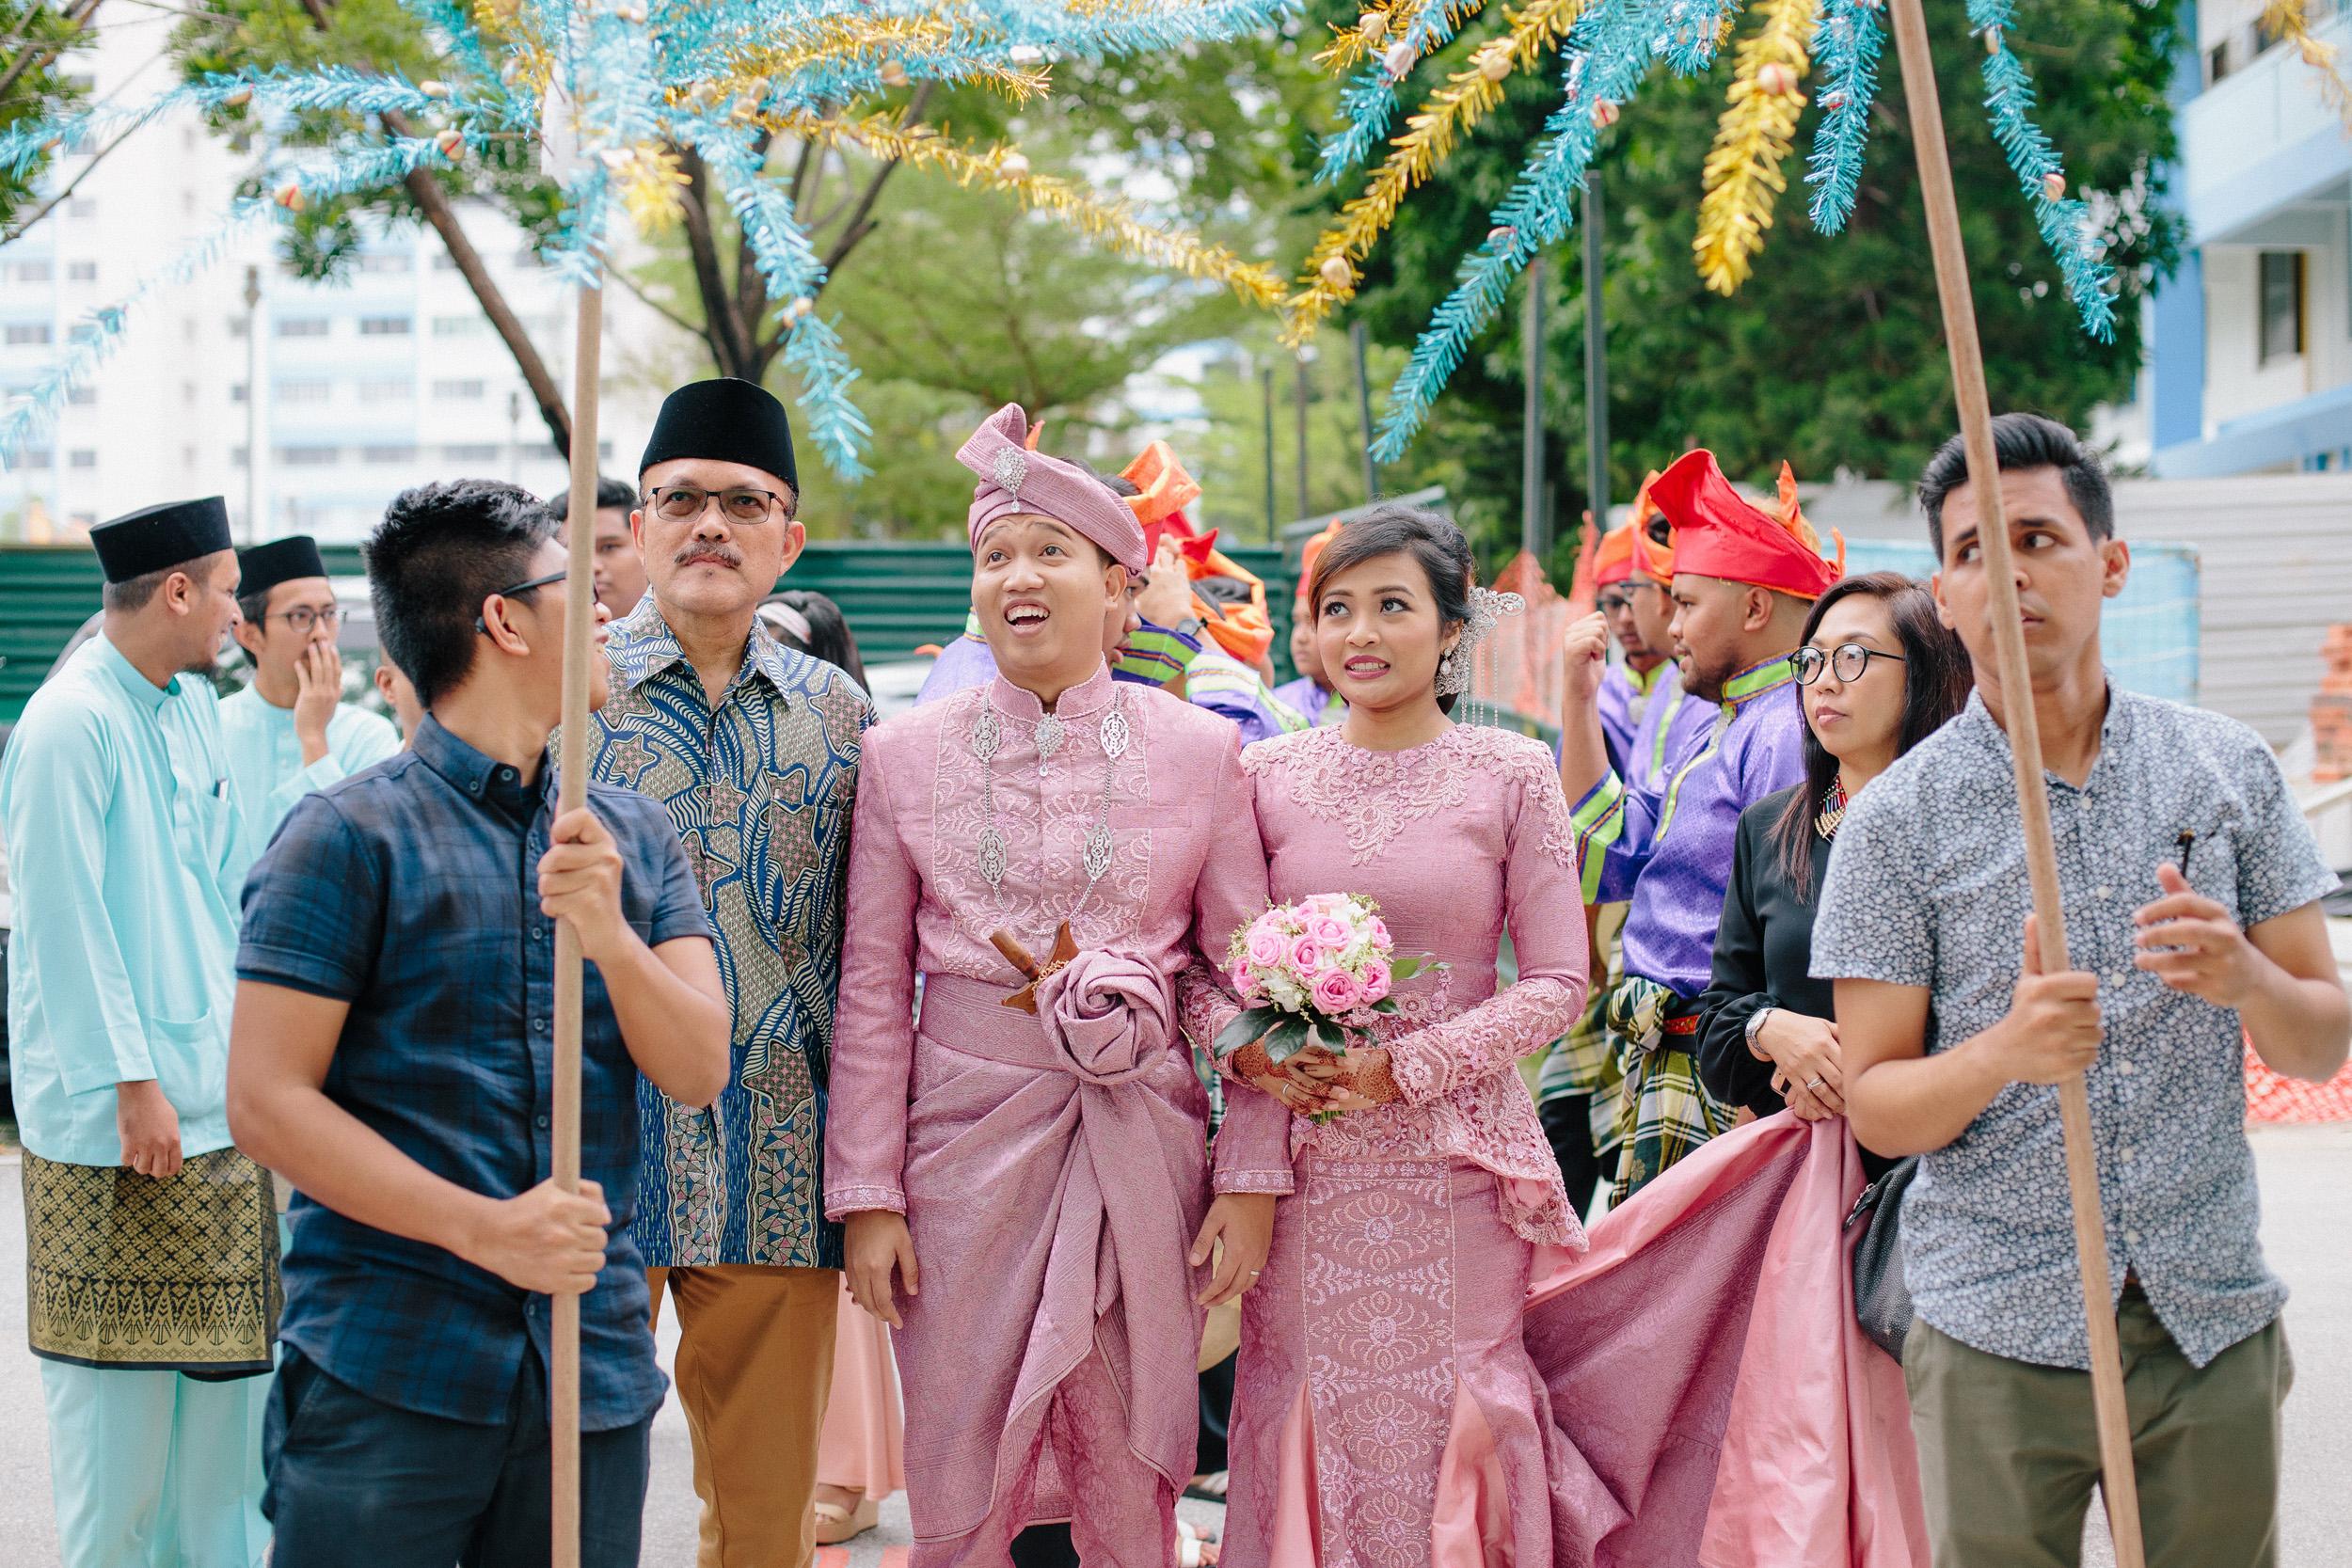 singapore-wedding-photographer-photography-wmt2017-071.jpg